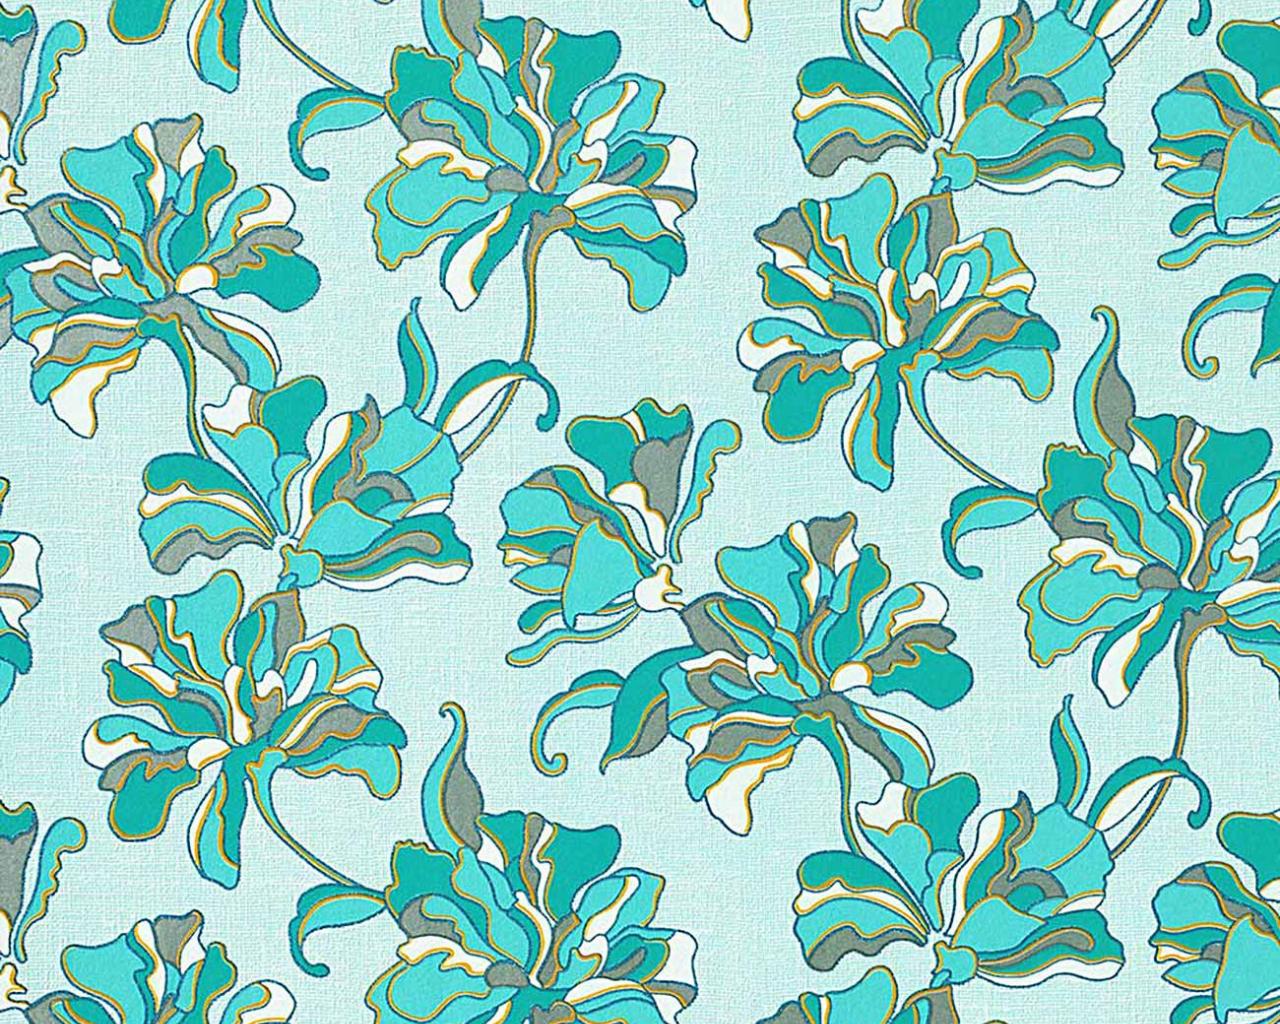 Free Download 22 Wallpaper Floral Design Flowers Textured Vinyl